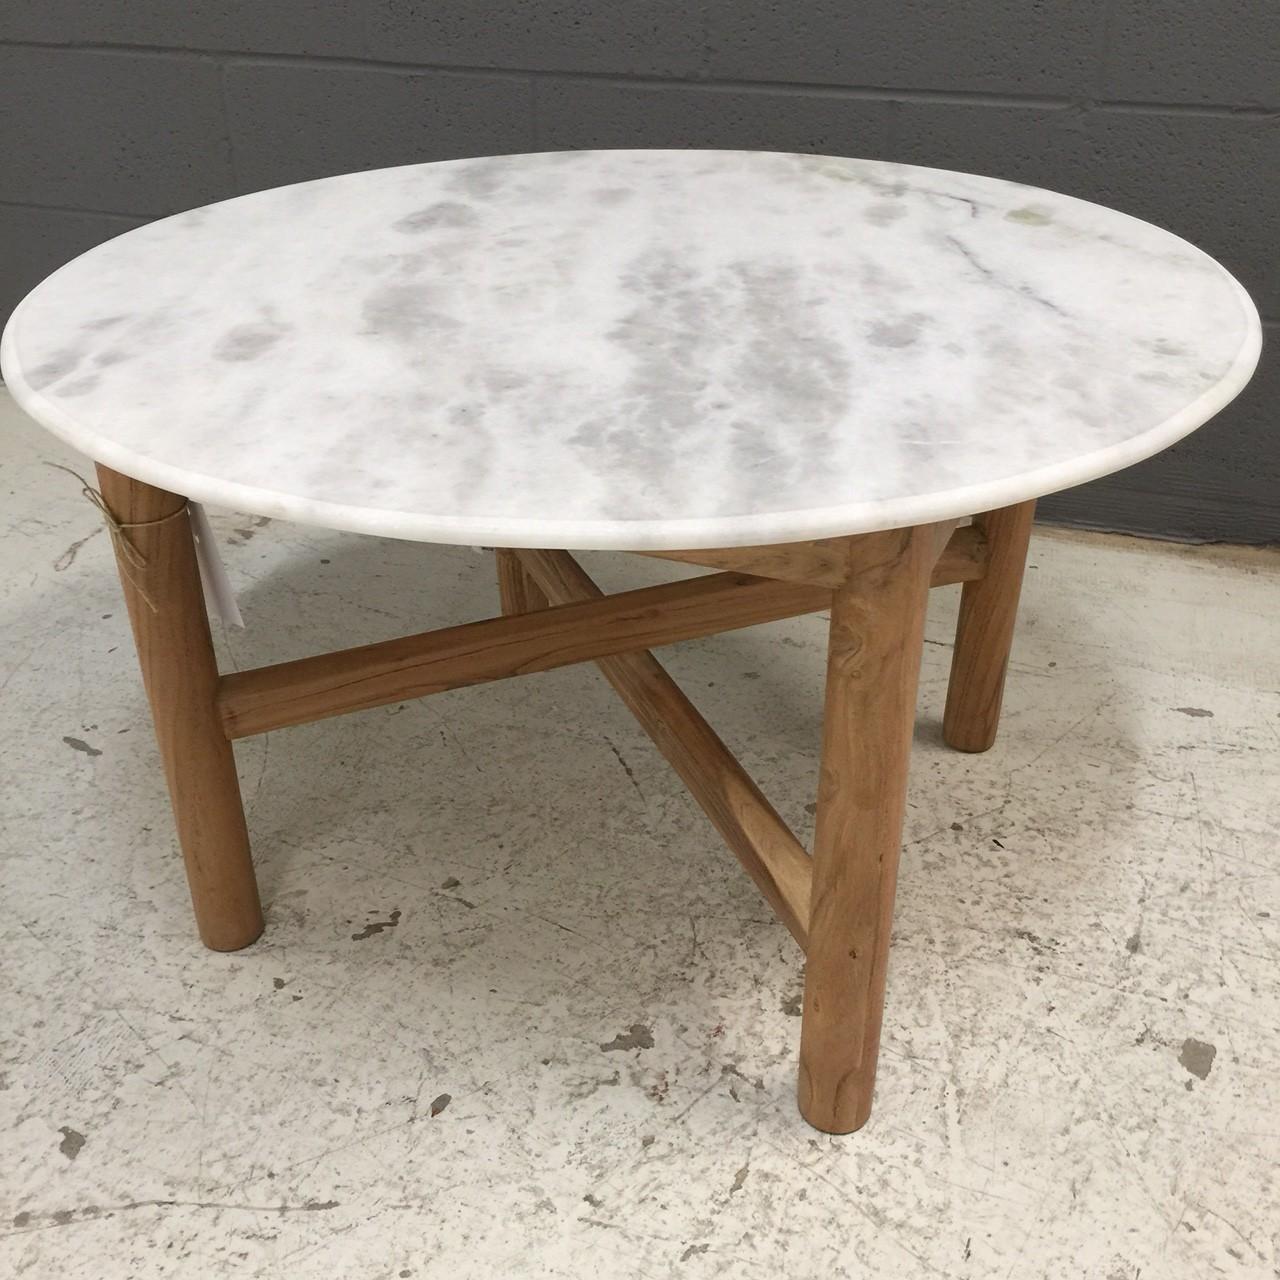 Round Marble Coffee Table: Round Marble Coffee Table